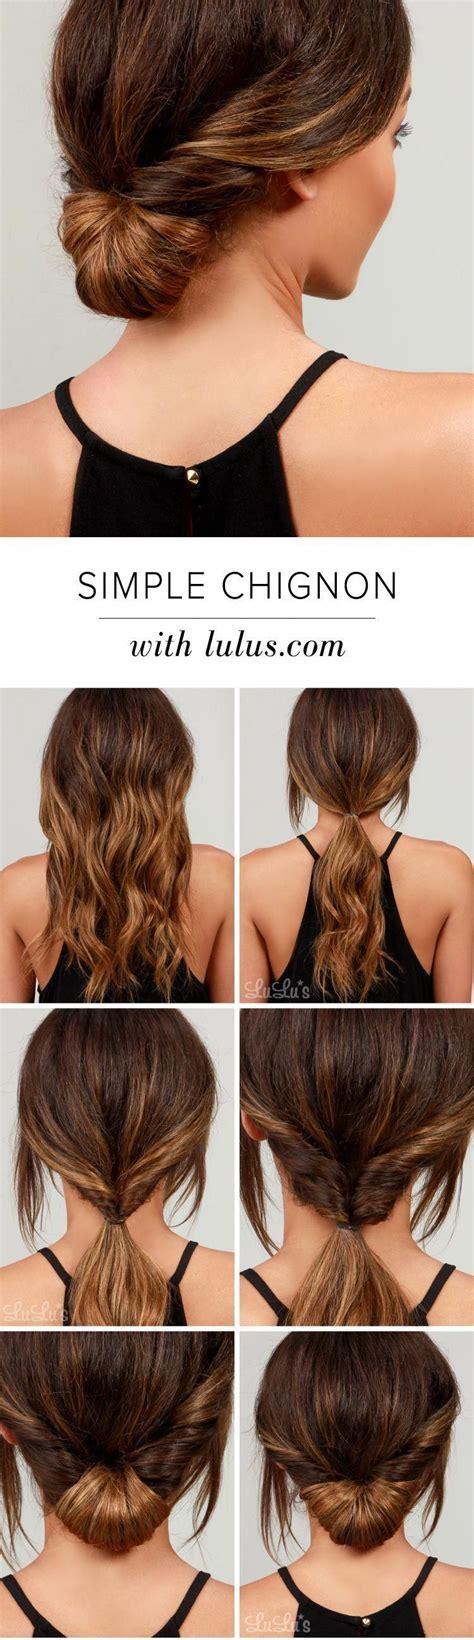 Simple Chignon #easylonghairstyles Hair styles Easy